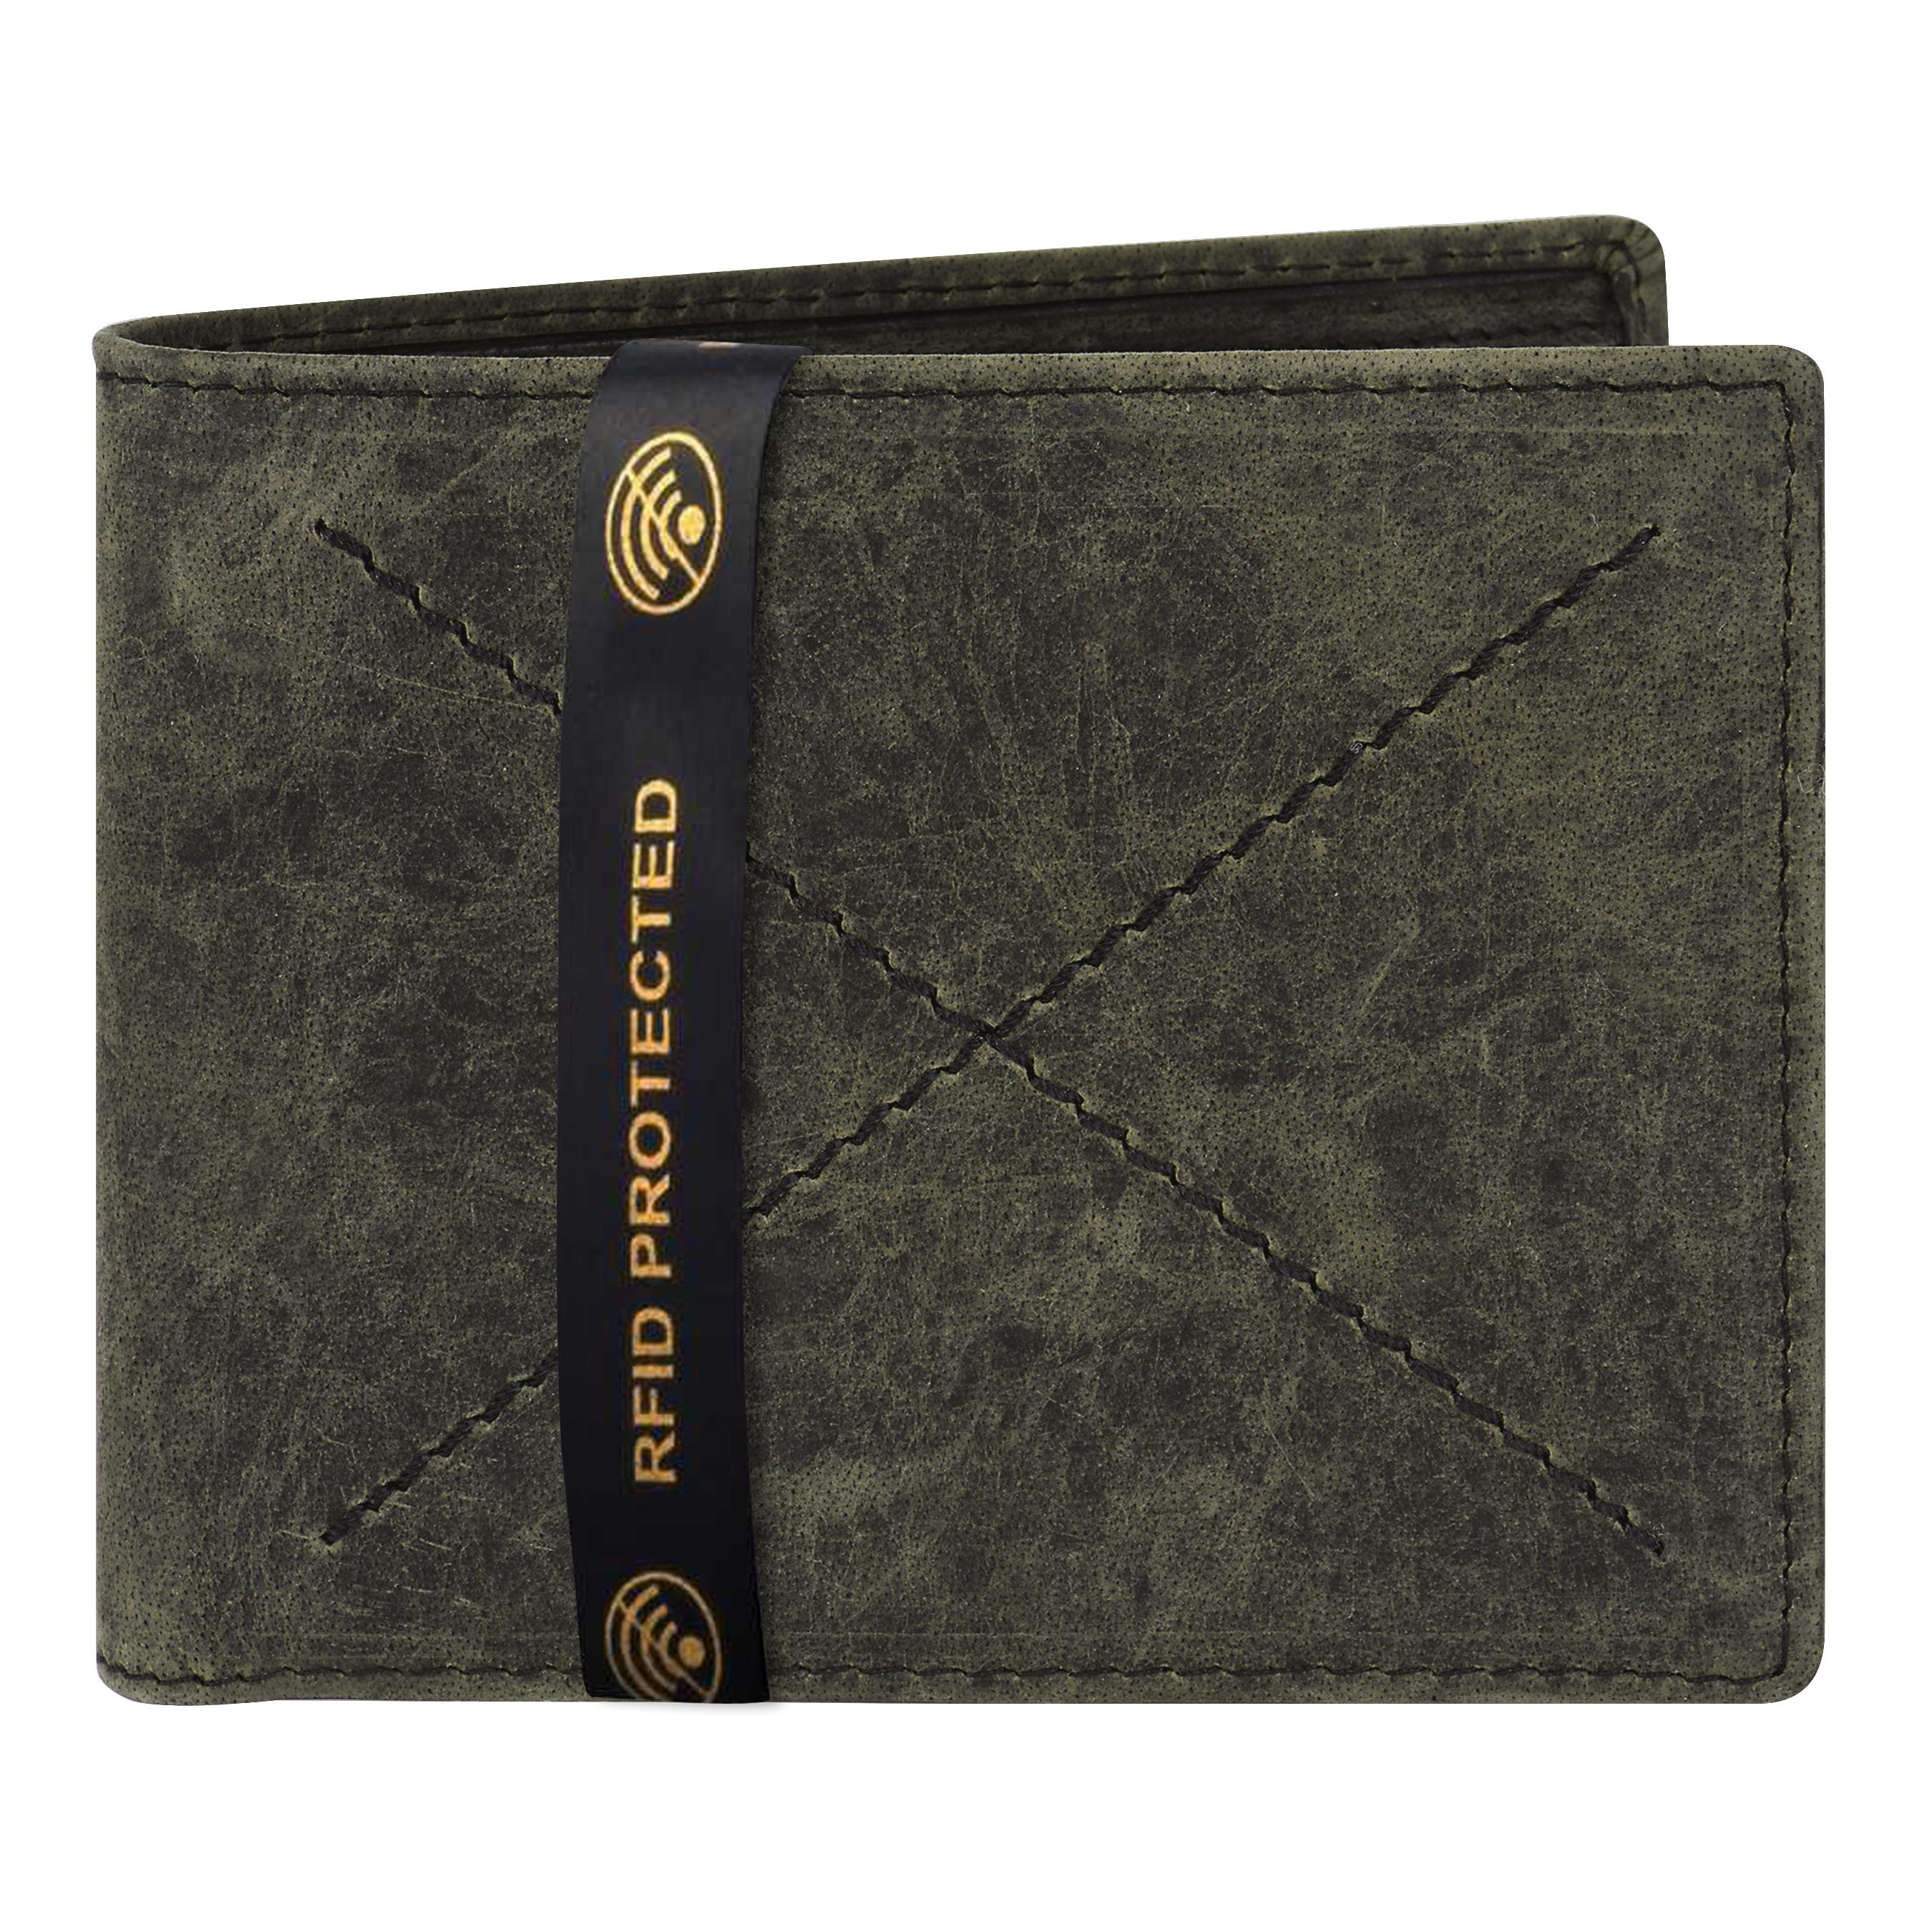 Walrus | Walrus Elite II Black Premium Genuine Leather Men Wallet With RFID Protection.